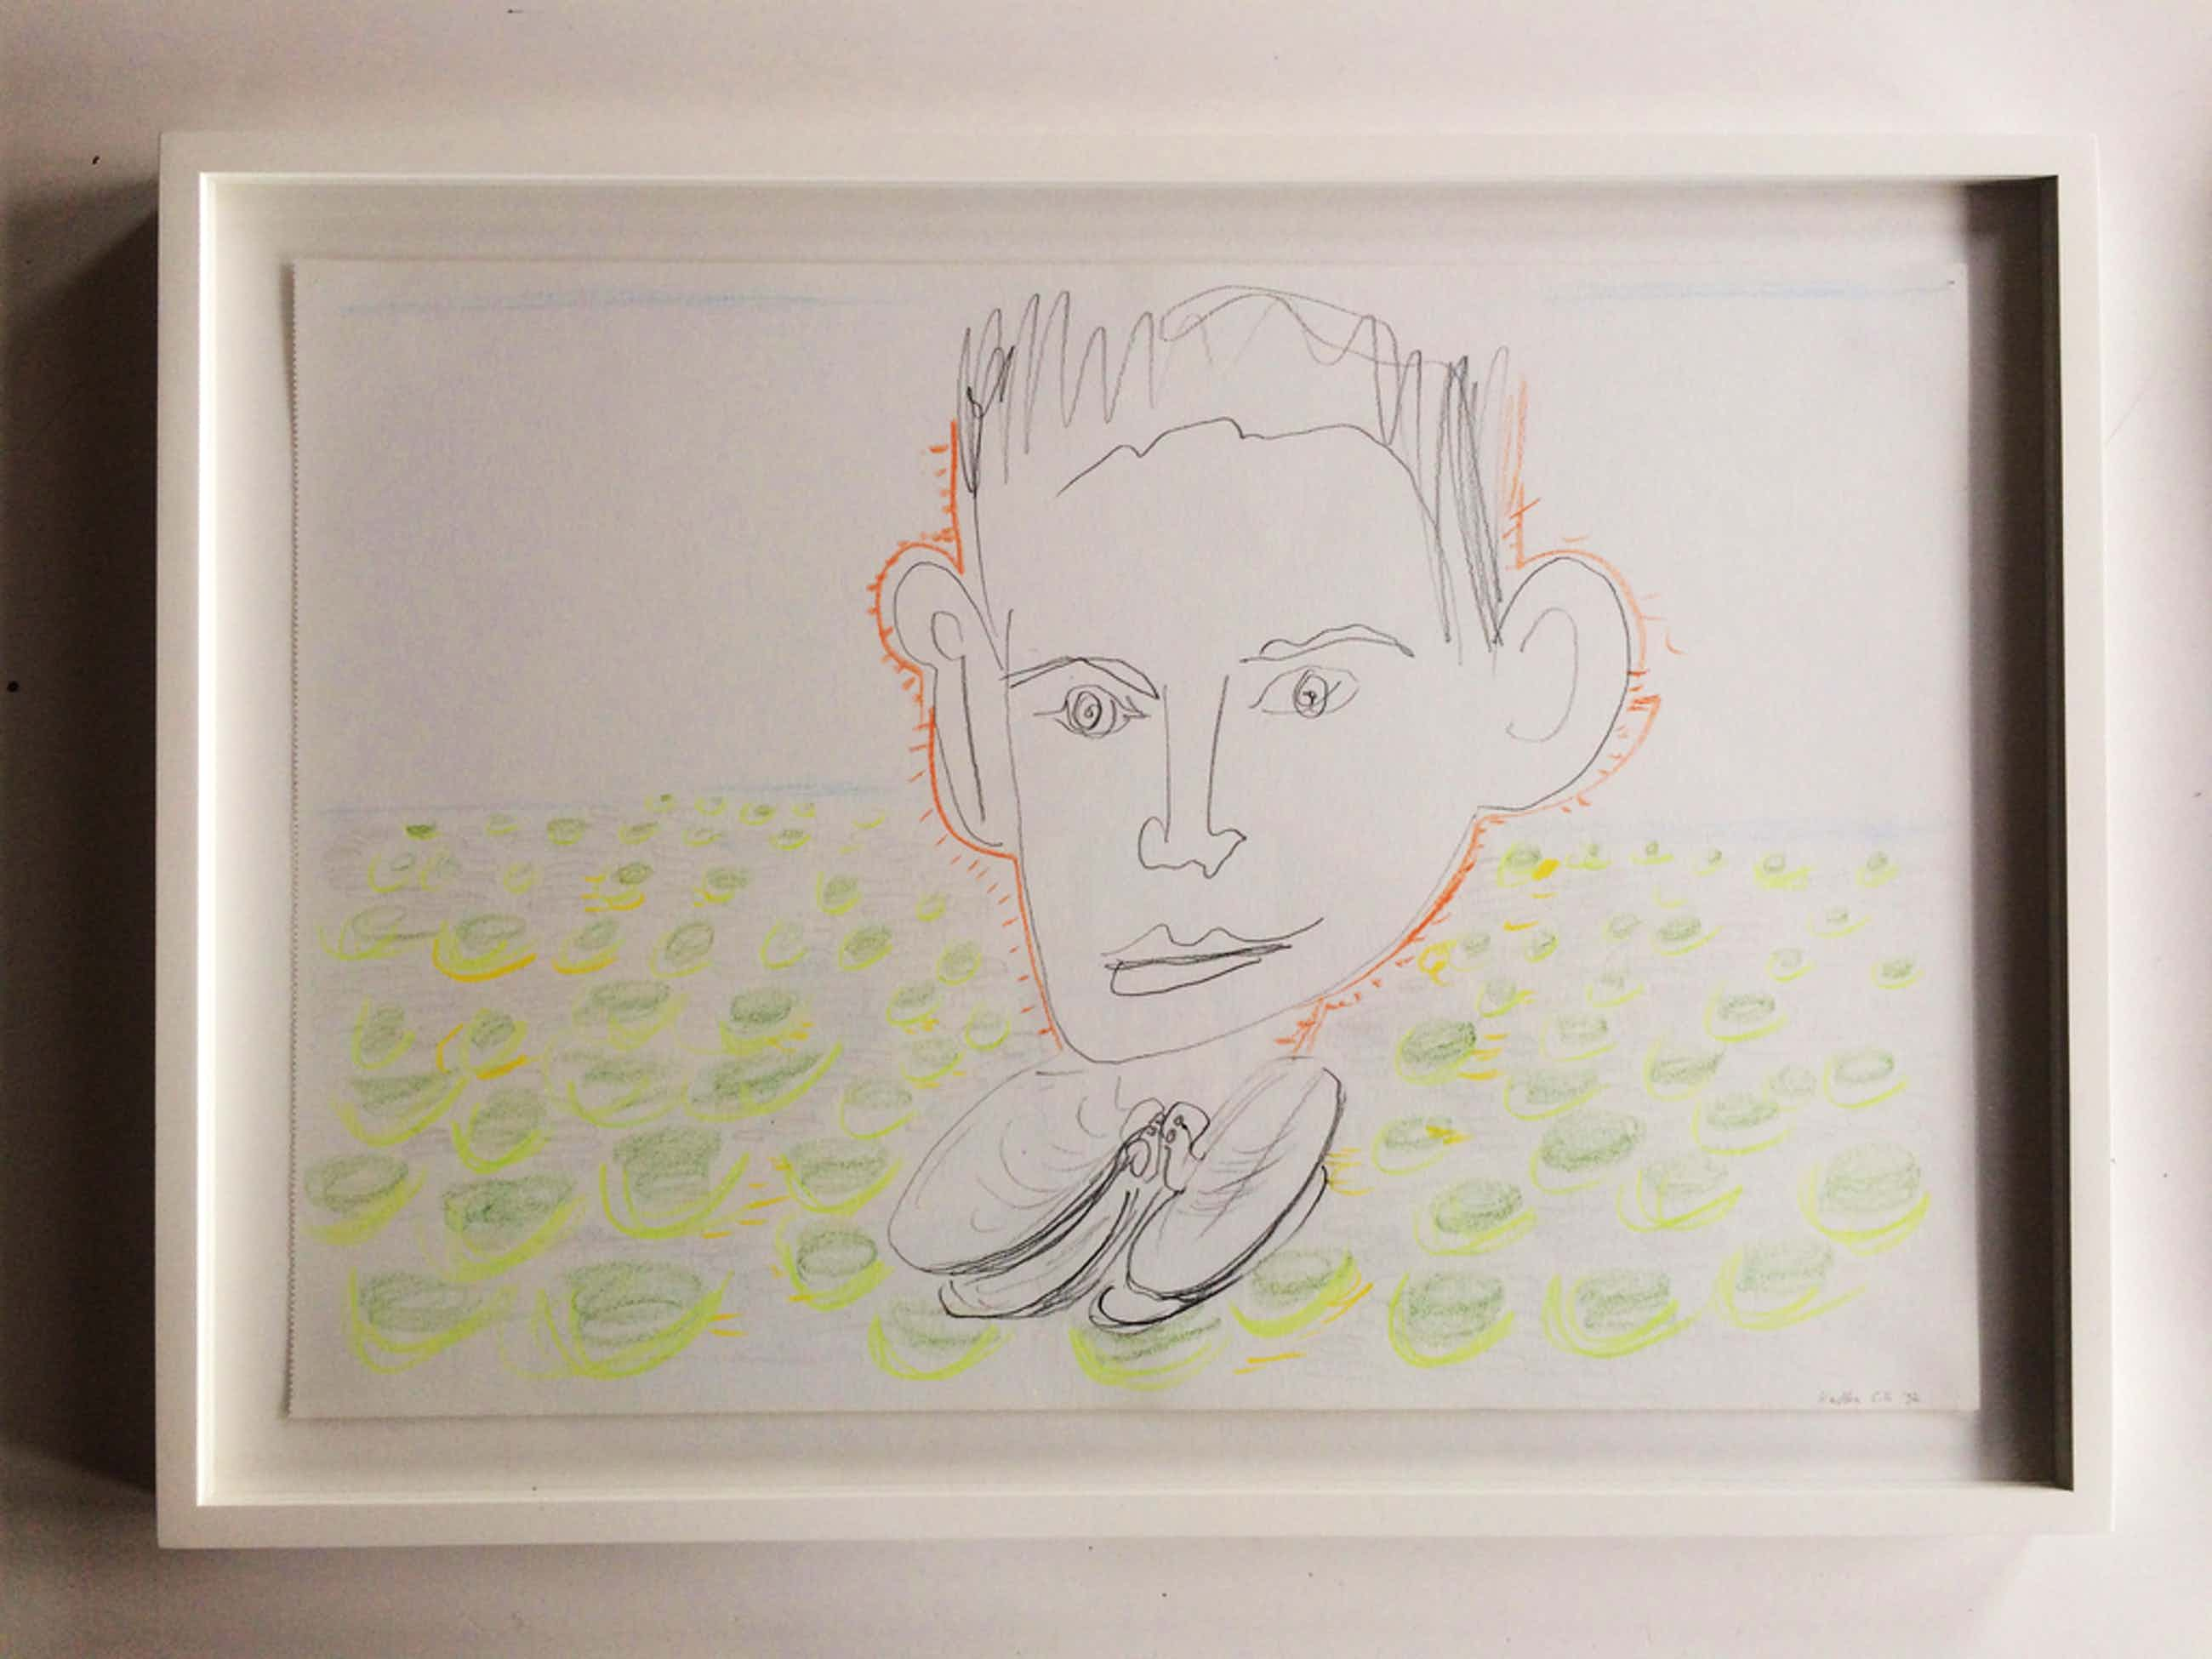 Emo Verkerk, Kafka, 1992, pencil and color pencil on paper   kopen? Bied vanaf 390!